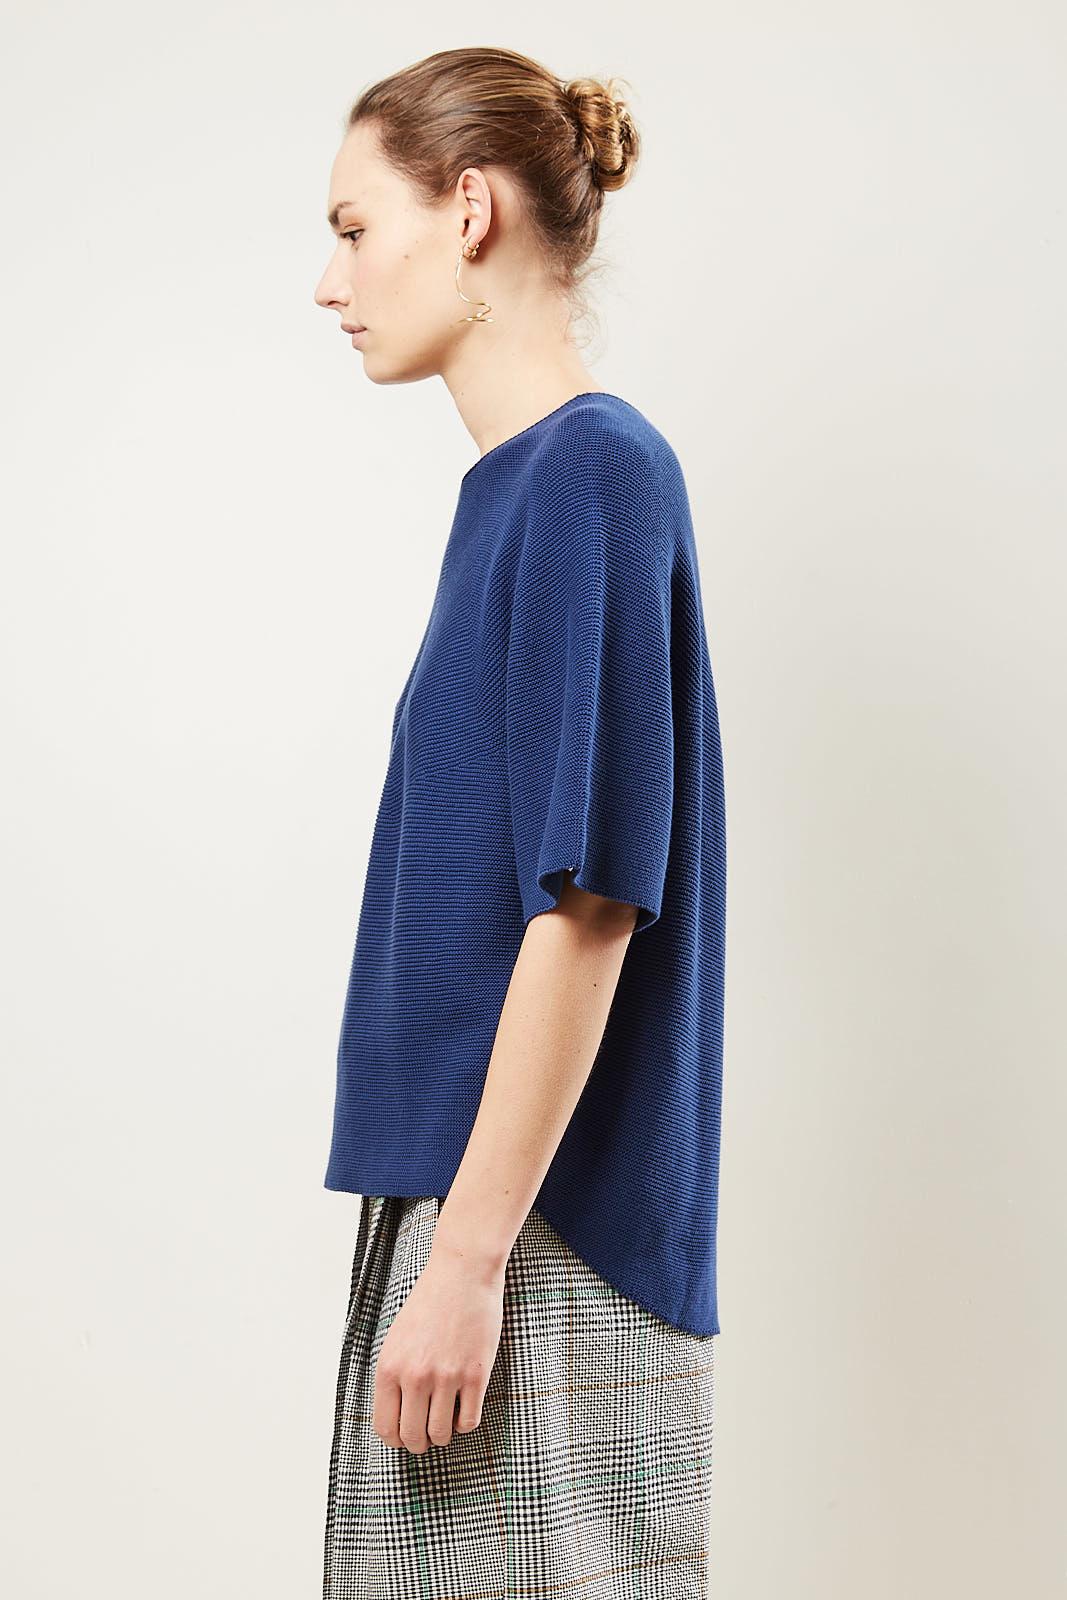 Christian Wijnants - Koda knitted top indigo.